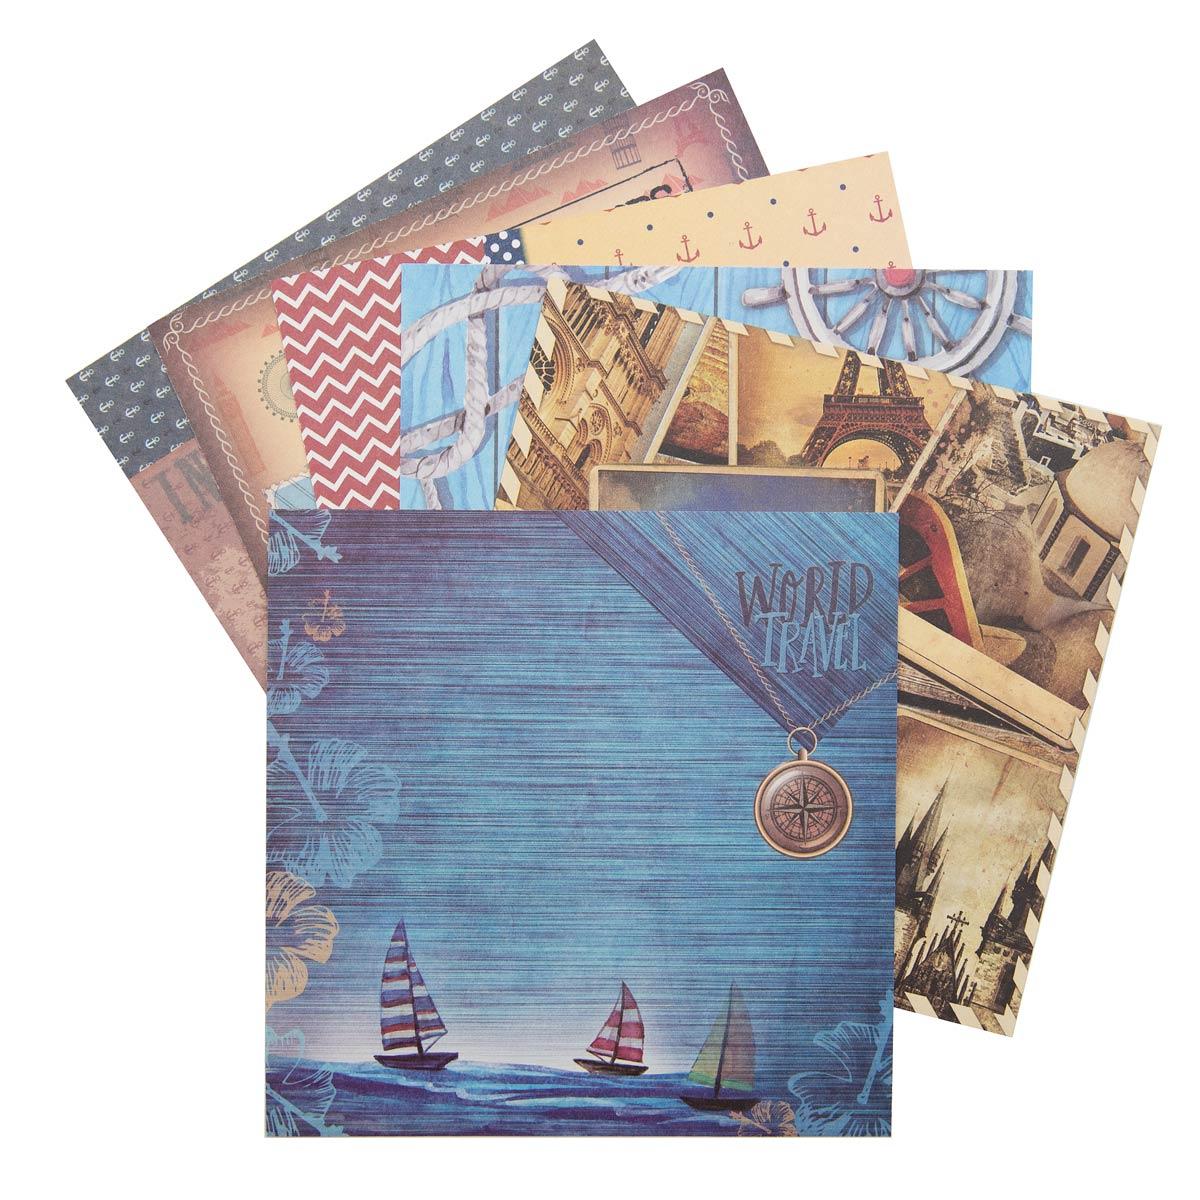 С2781-03 Цветная бумага для скрапбукинга. 6л. 15x15 'Путешествия'